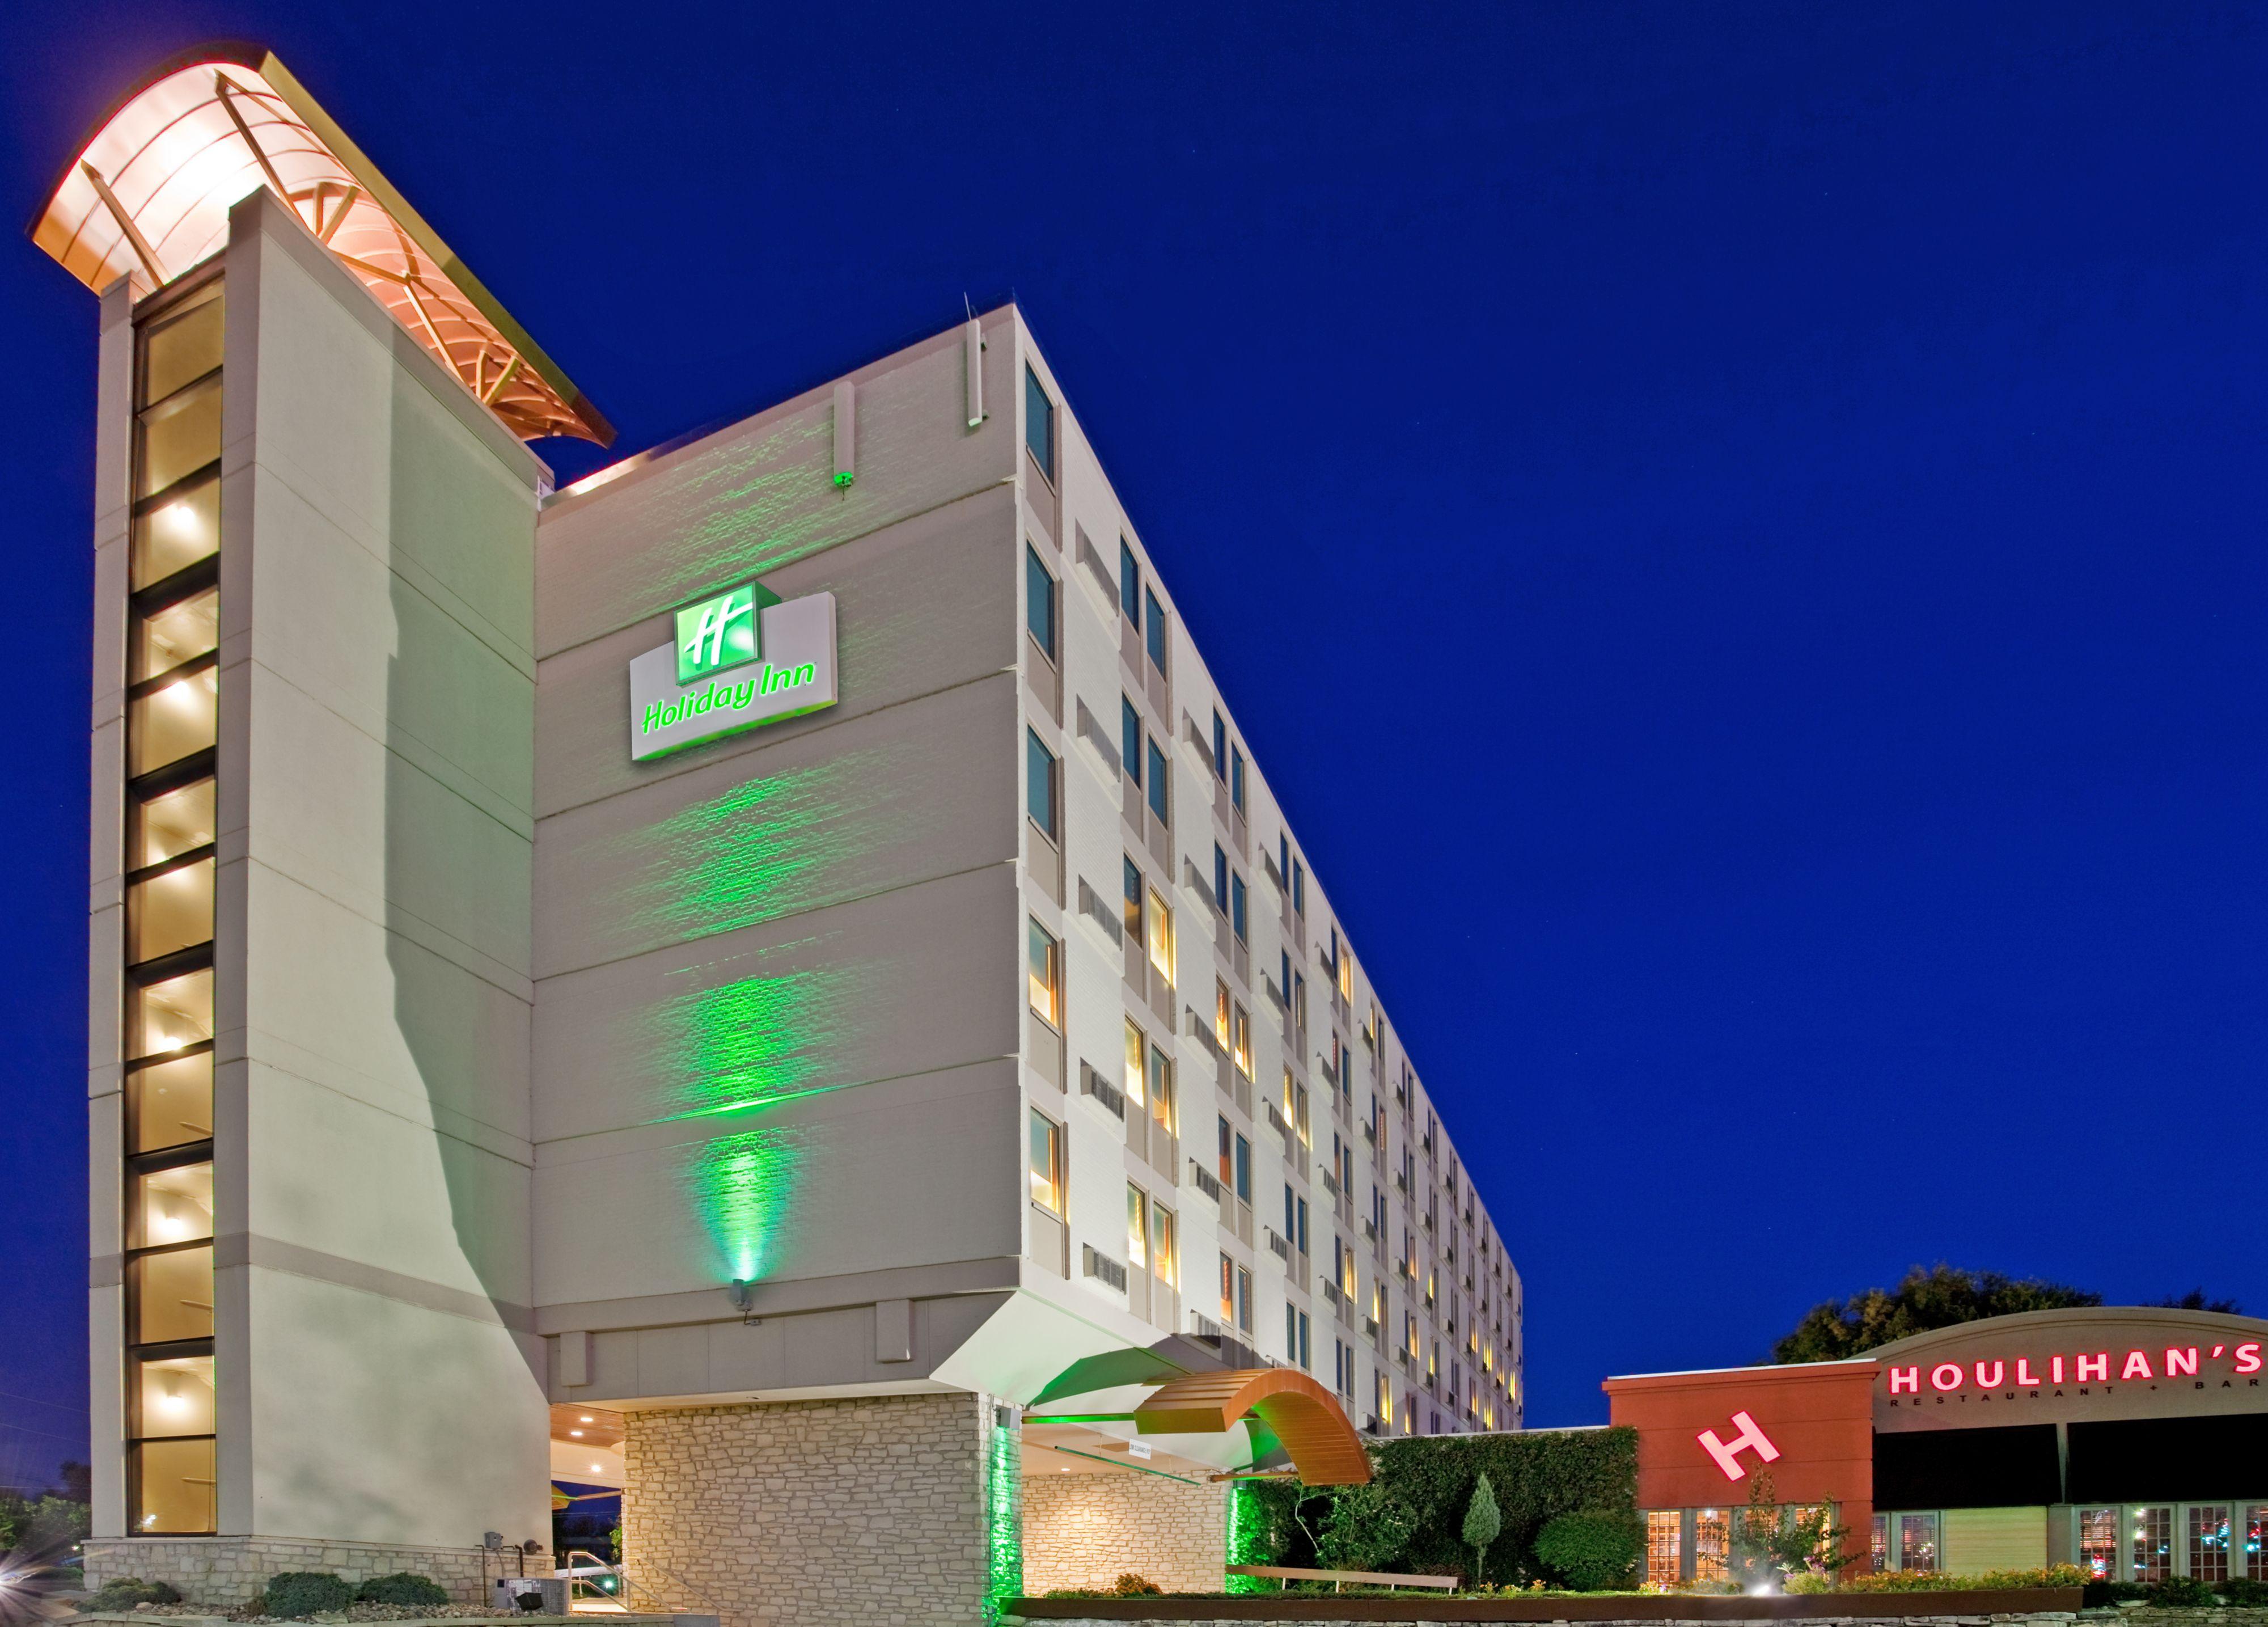 Holiday Inn Manhattan At The Campus image 4